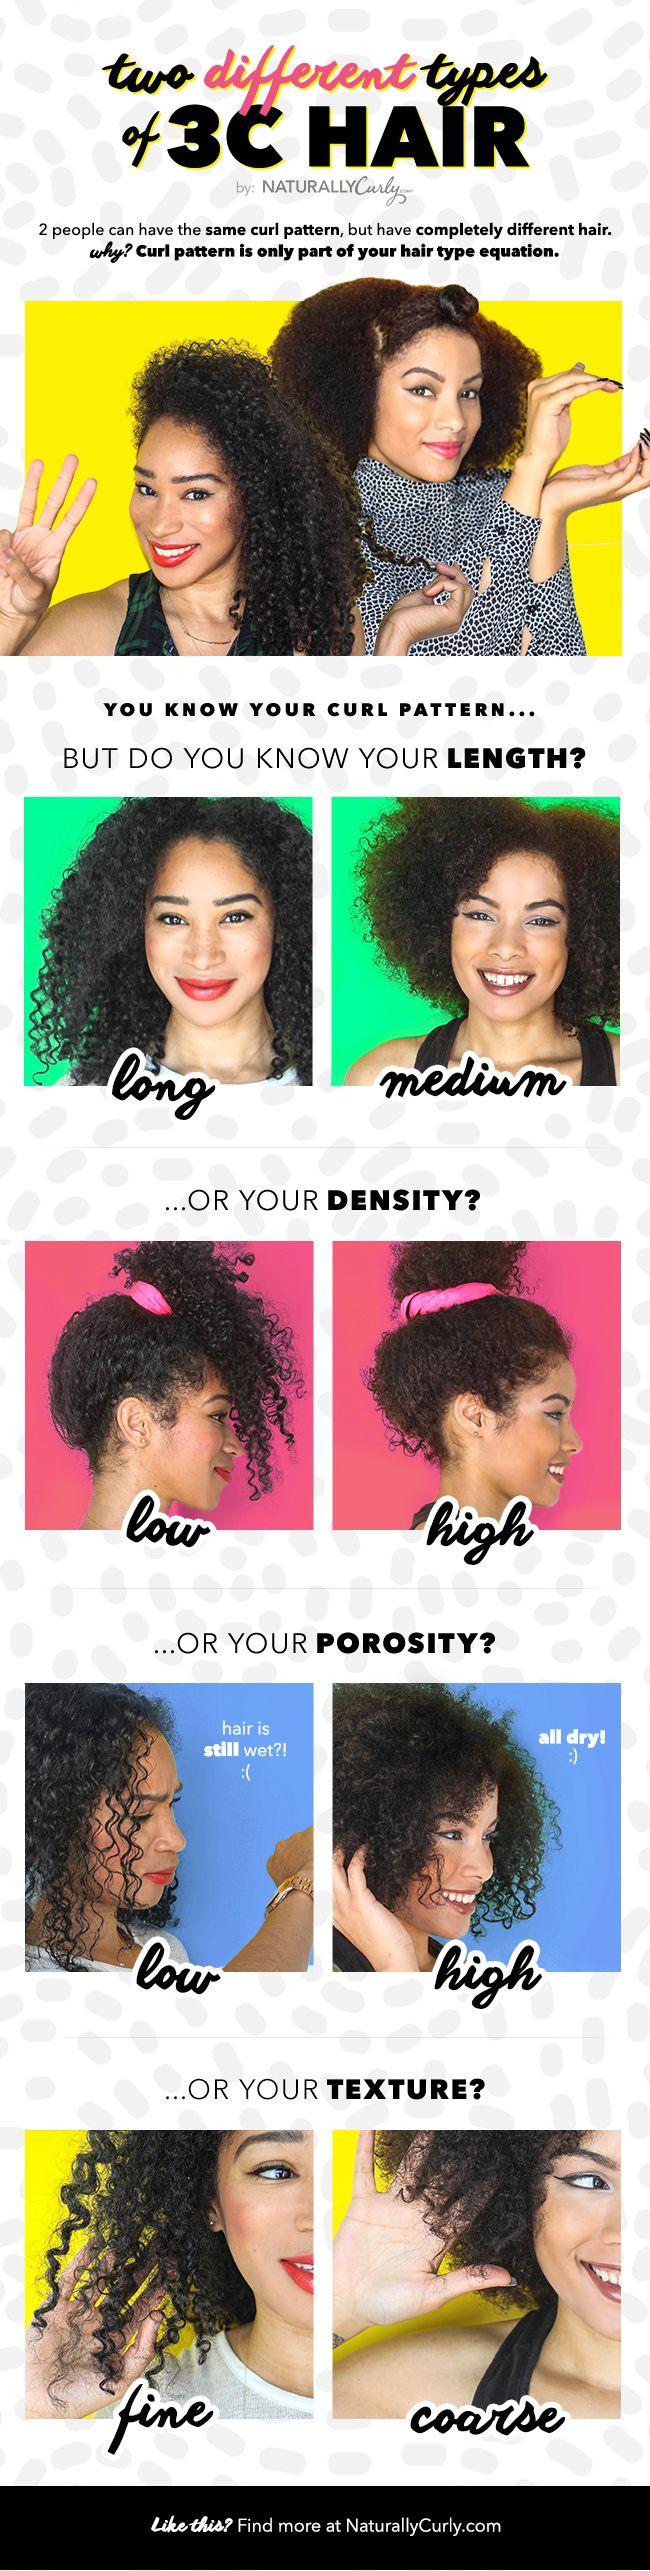 3c hair type infographic